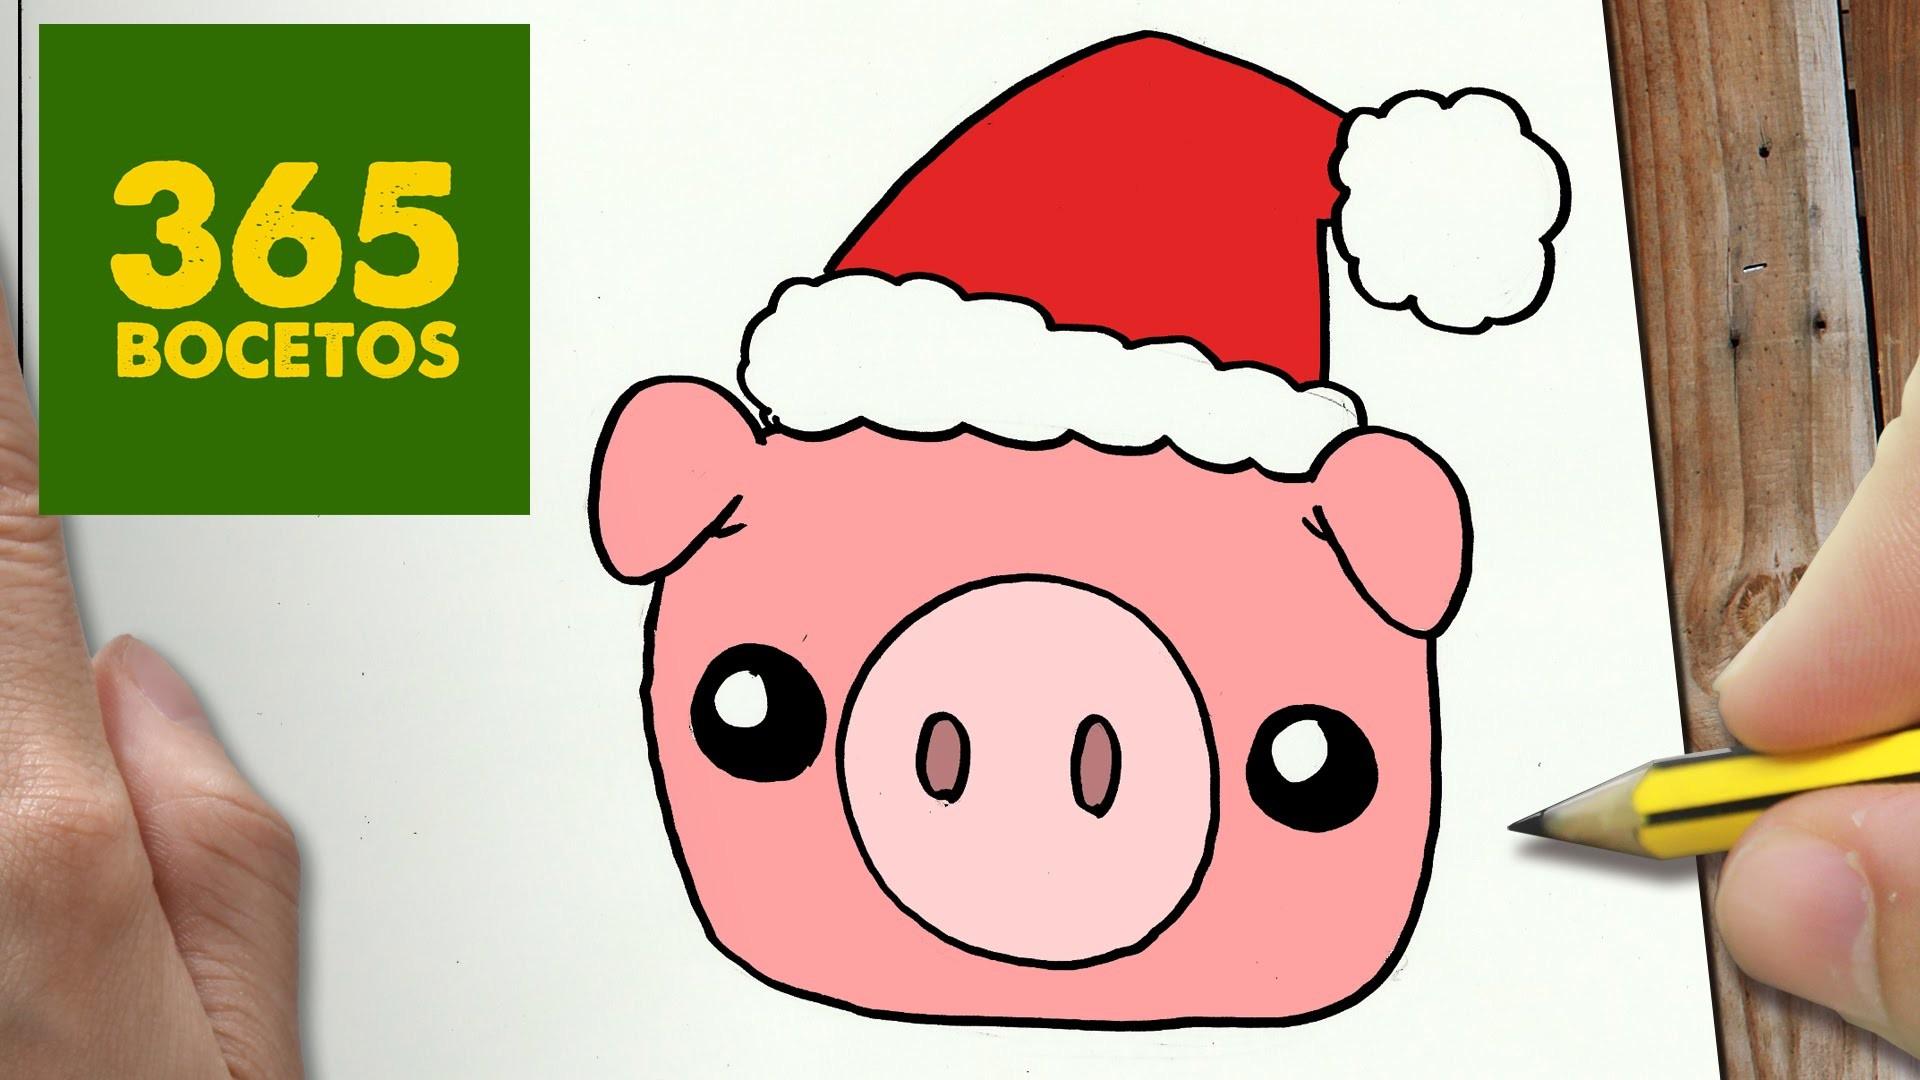 Como Dibujar Un Cuaderno Para Navidad Paso A Paso Dibujos: COMO DIBUJAR UN CERDO PARA NAVIDAD PASO A PASO: Dibujos